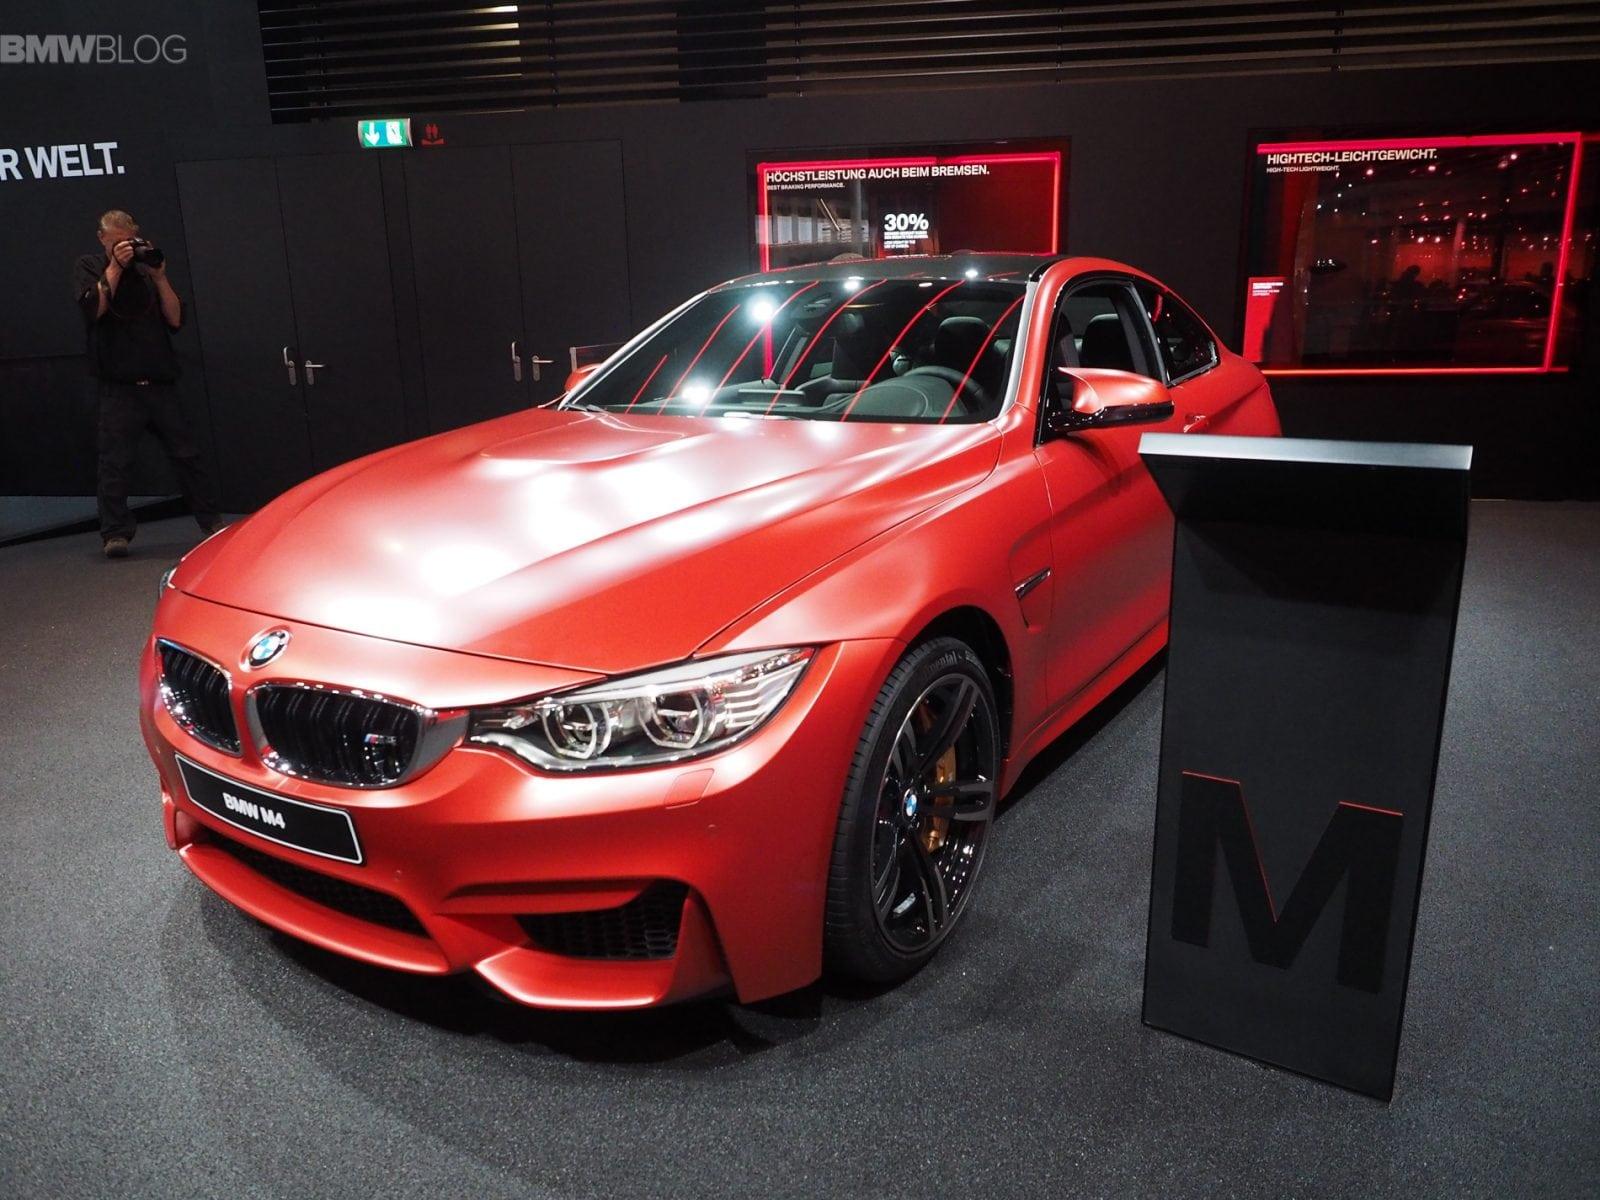 BMW M4 в цвете Frozen Red Metallic представлена во Франкфурте